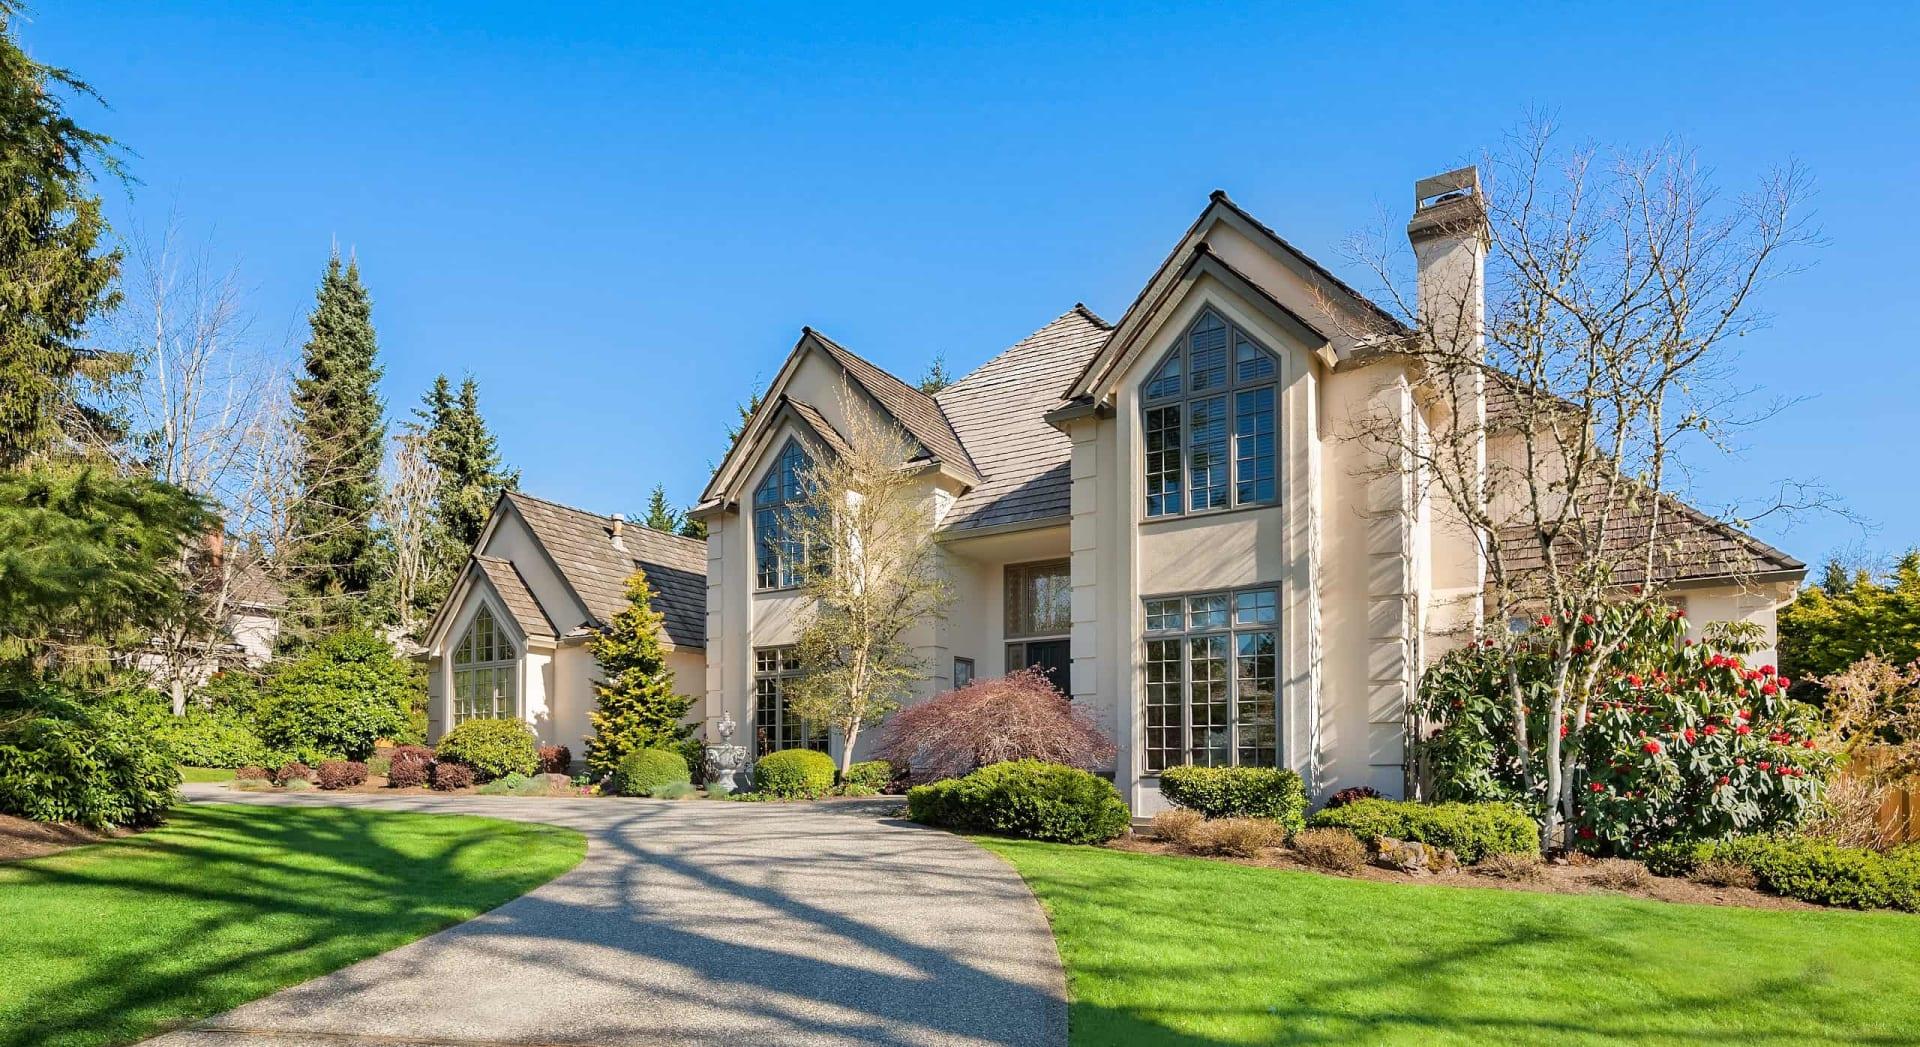 $1,893,000 / 17306 NE 129th  Street Redmond, 98052 image